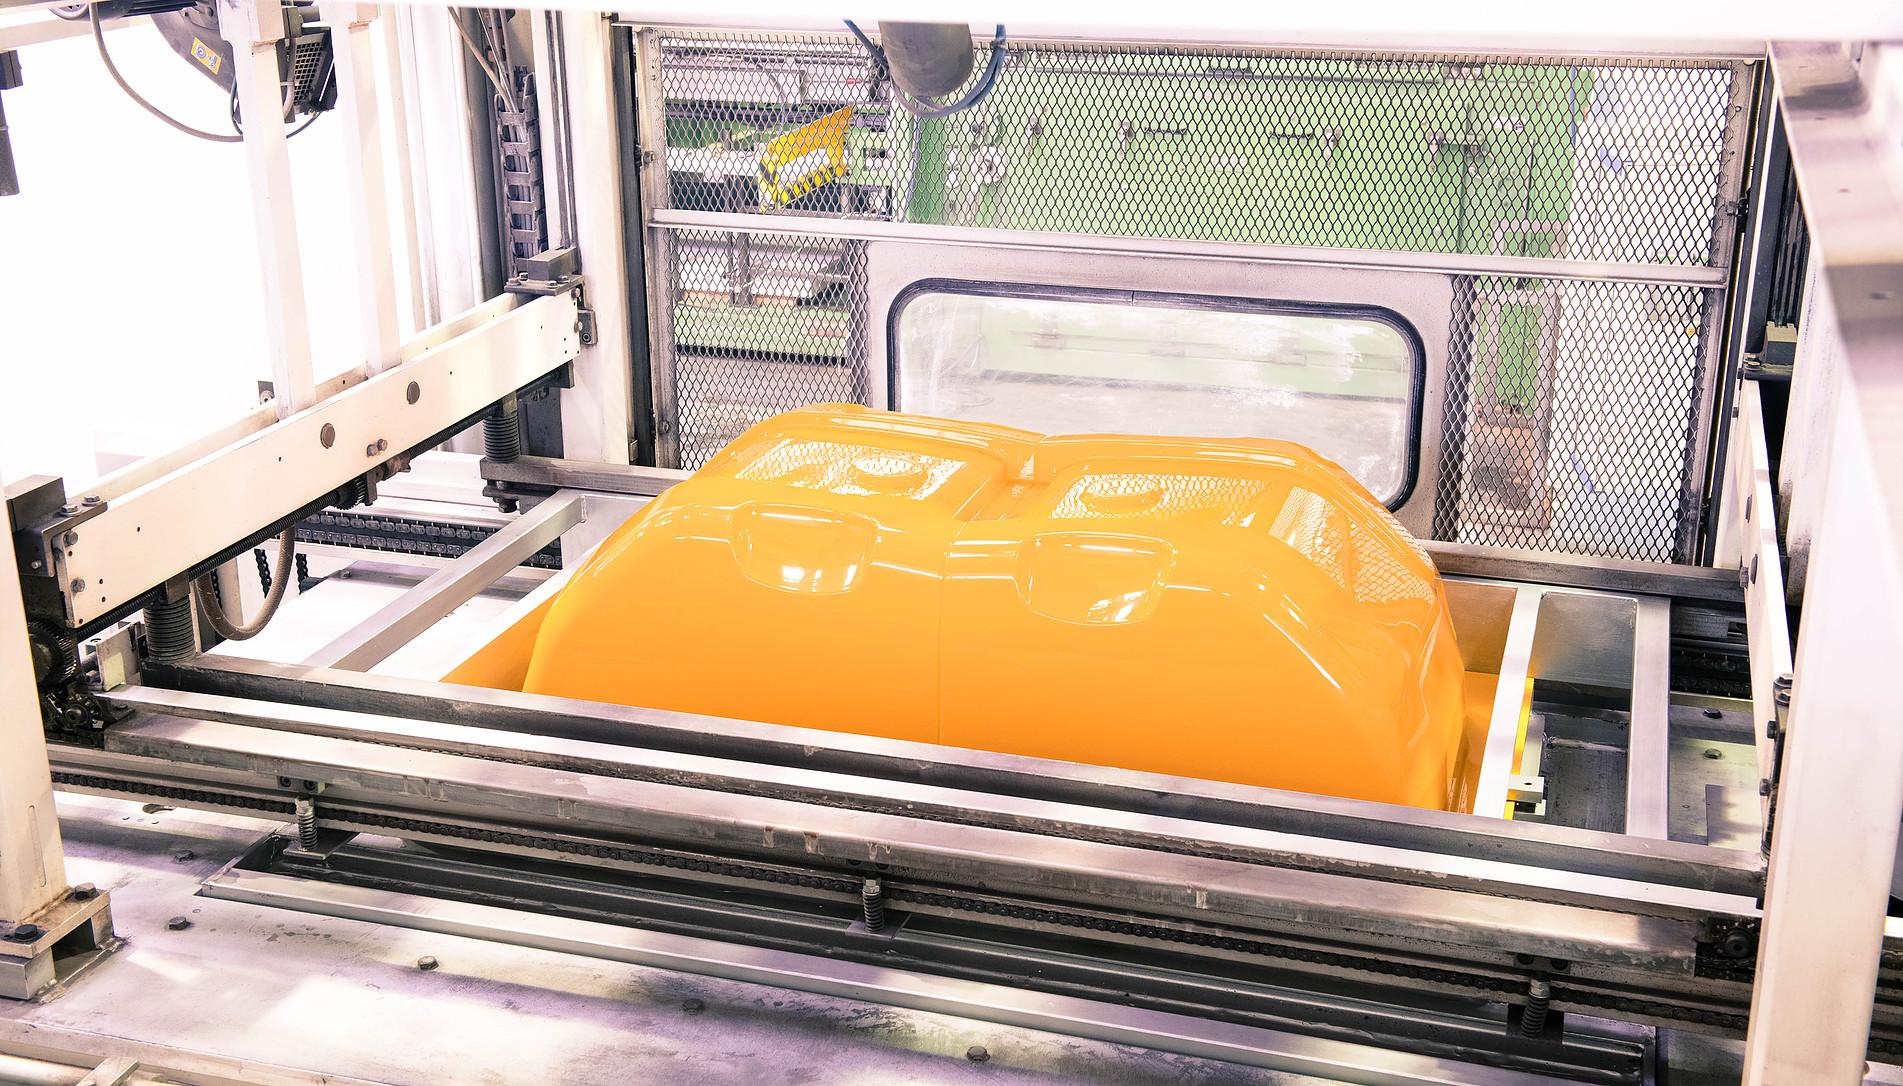 Bauteil orange